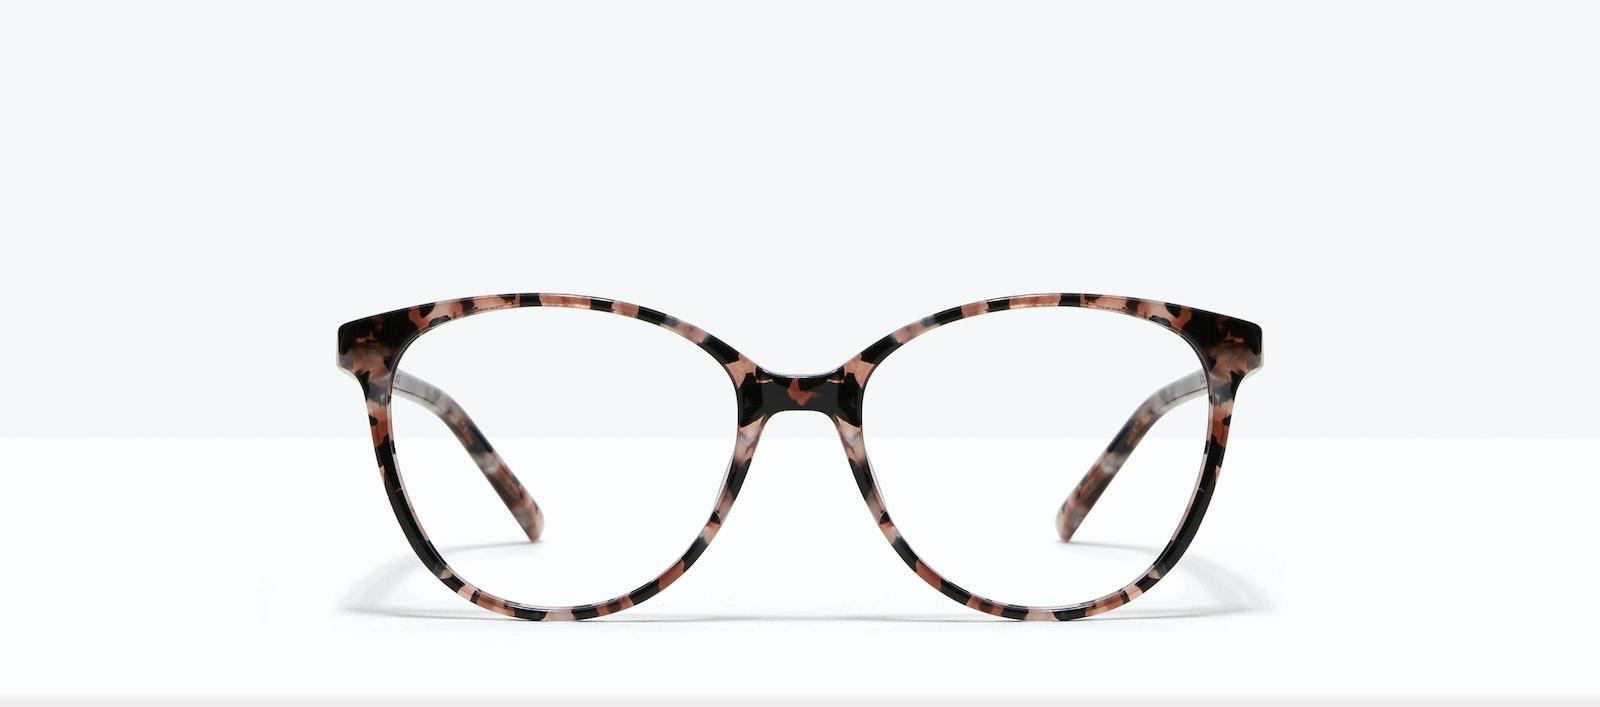 Affordable Fashion Glasses Cat Eye Eyeglasses Women Imagine Plus Pink Tortoise Front